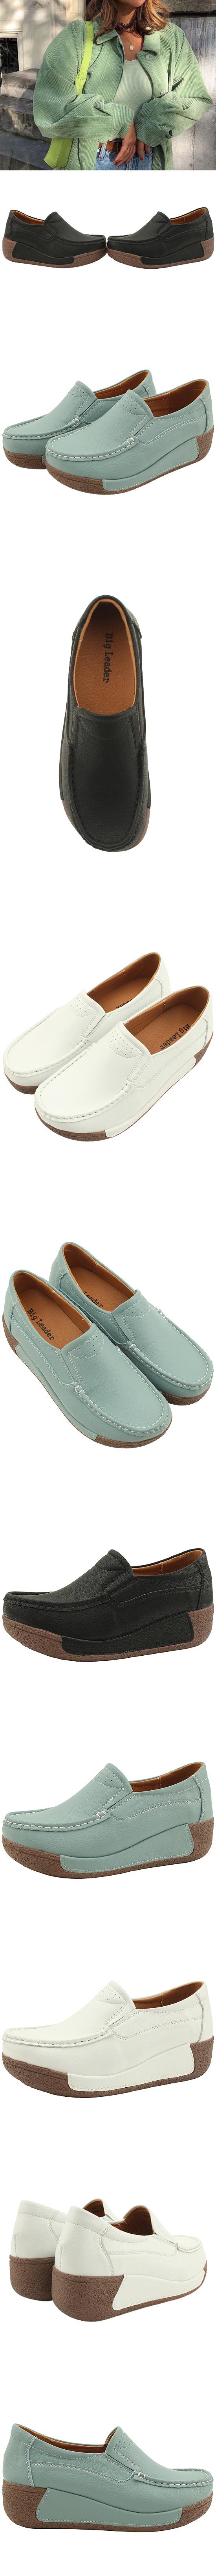 Cowhide leather heel loafers 5cm black